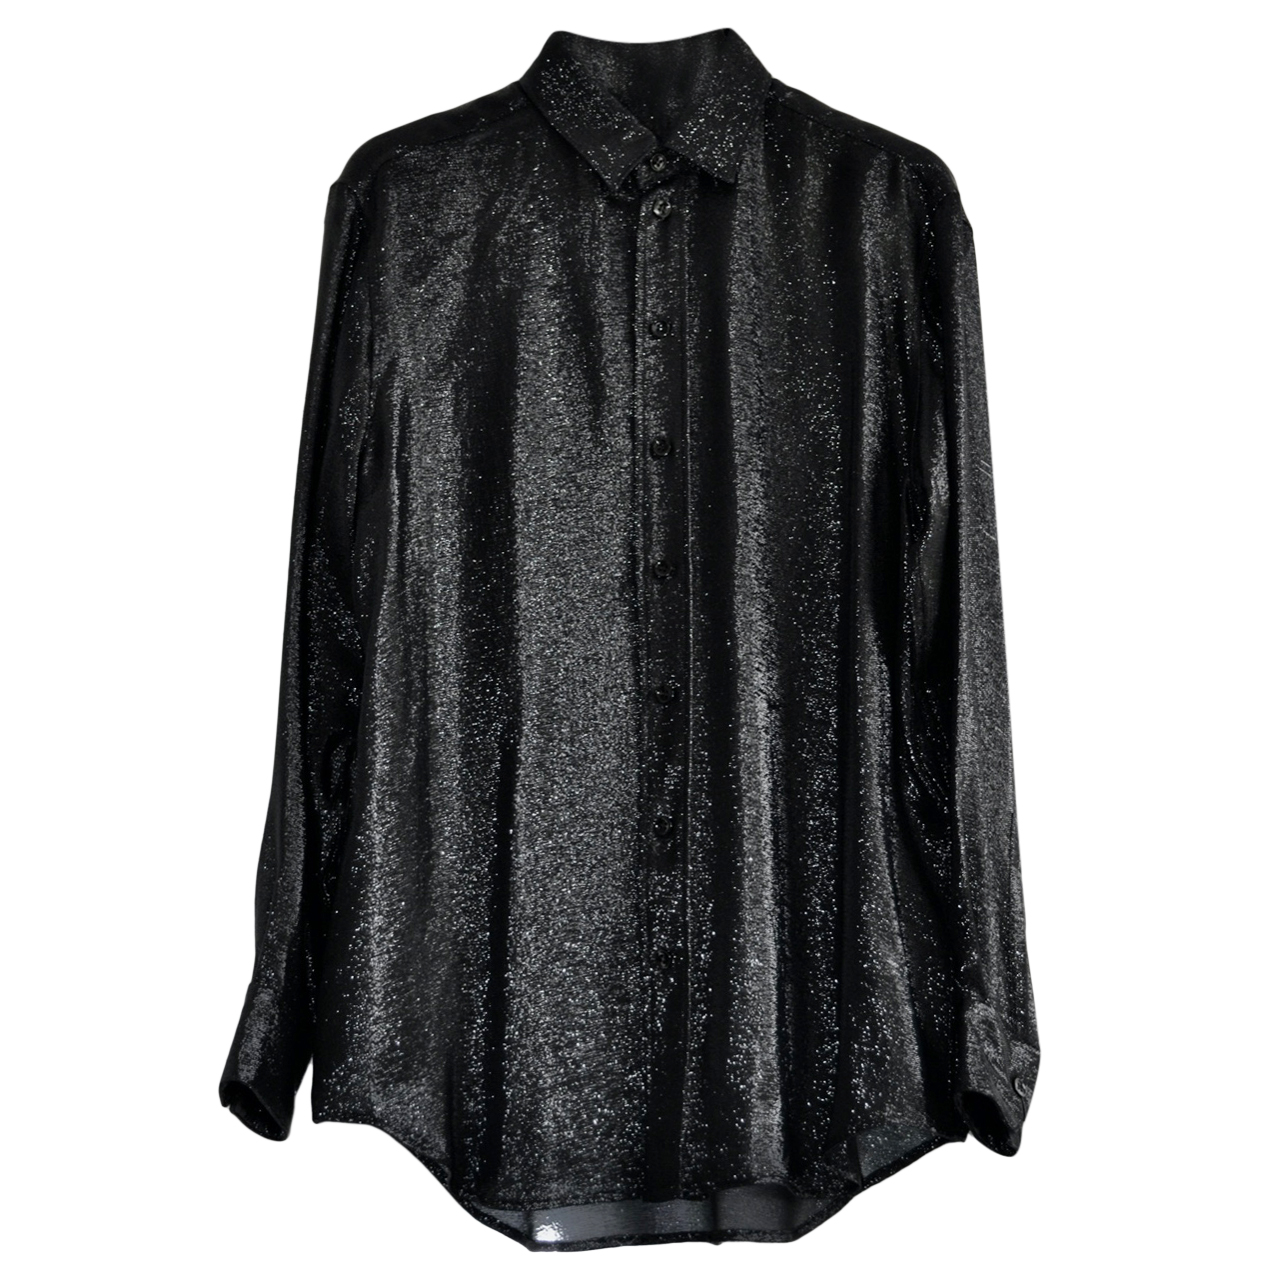 Saint Laurent Black Glitter Tailored Shirt